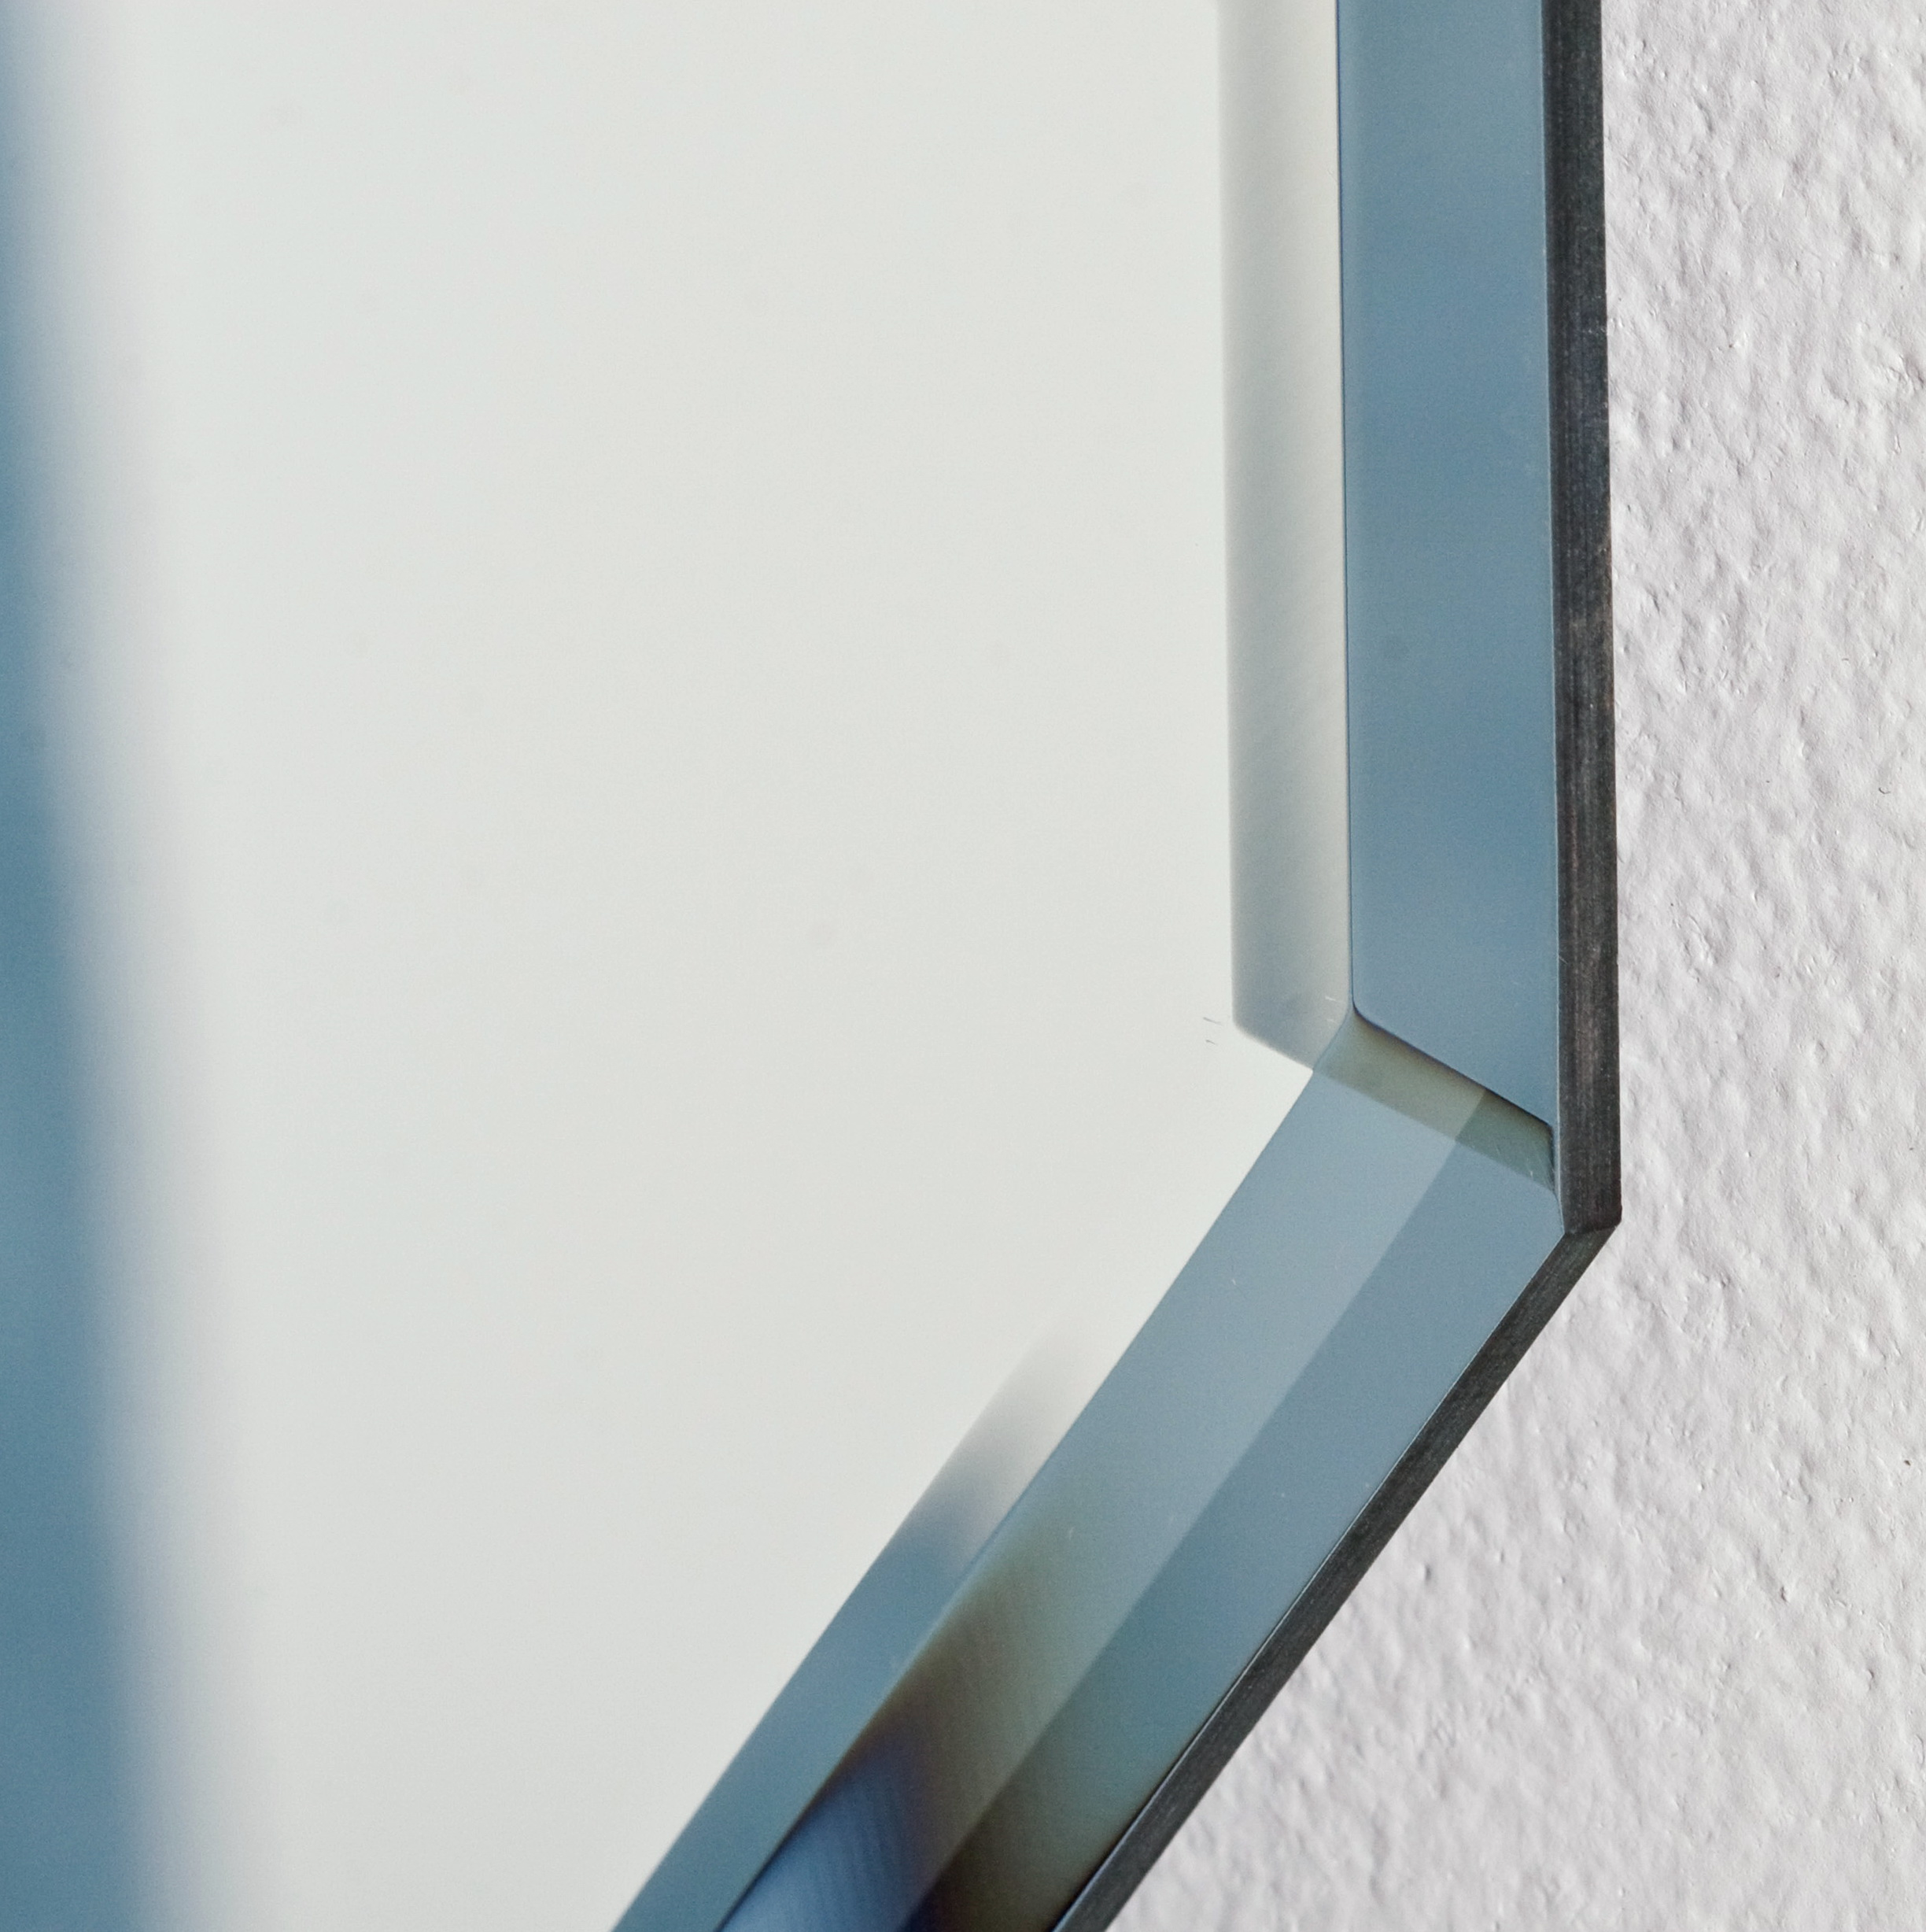 Beveled glass bathroom mirrors home design ideas for Beveled glass bathroom mirror